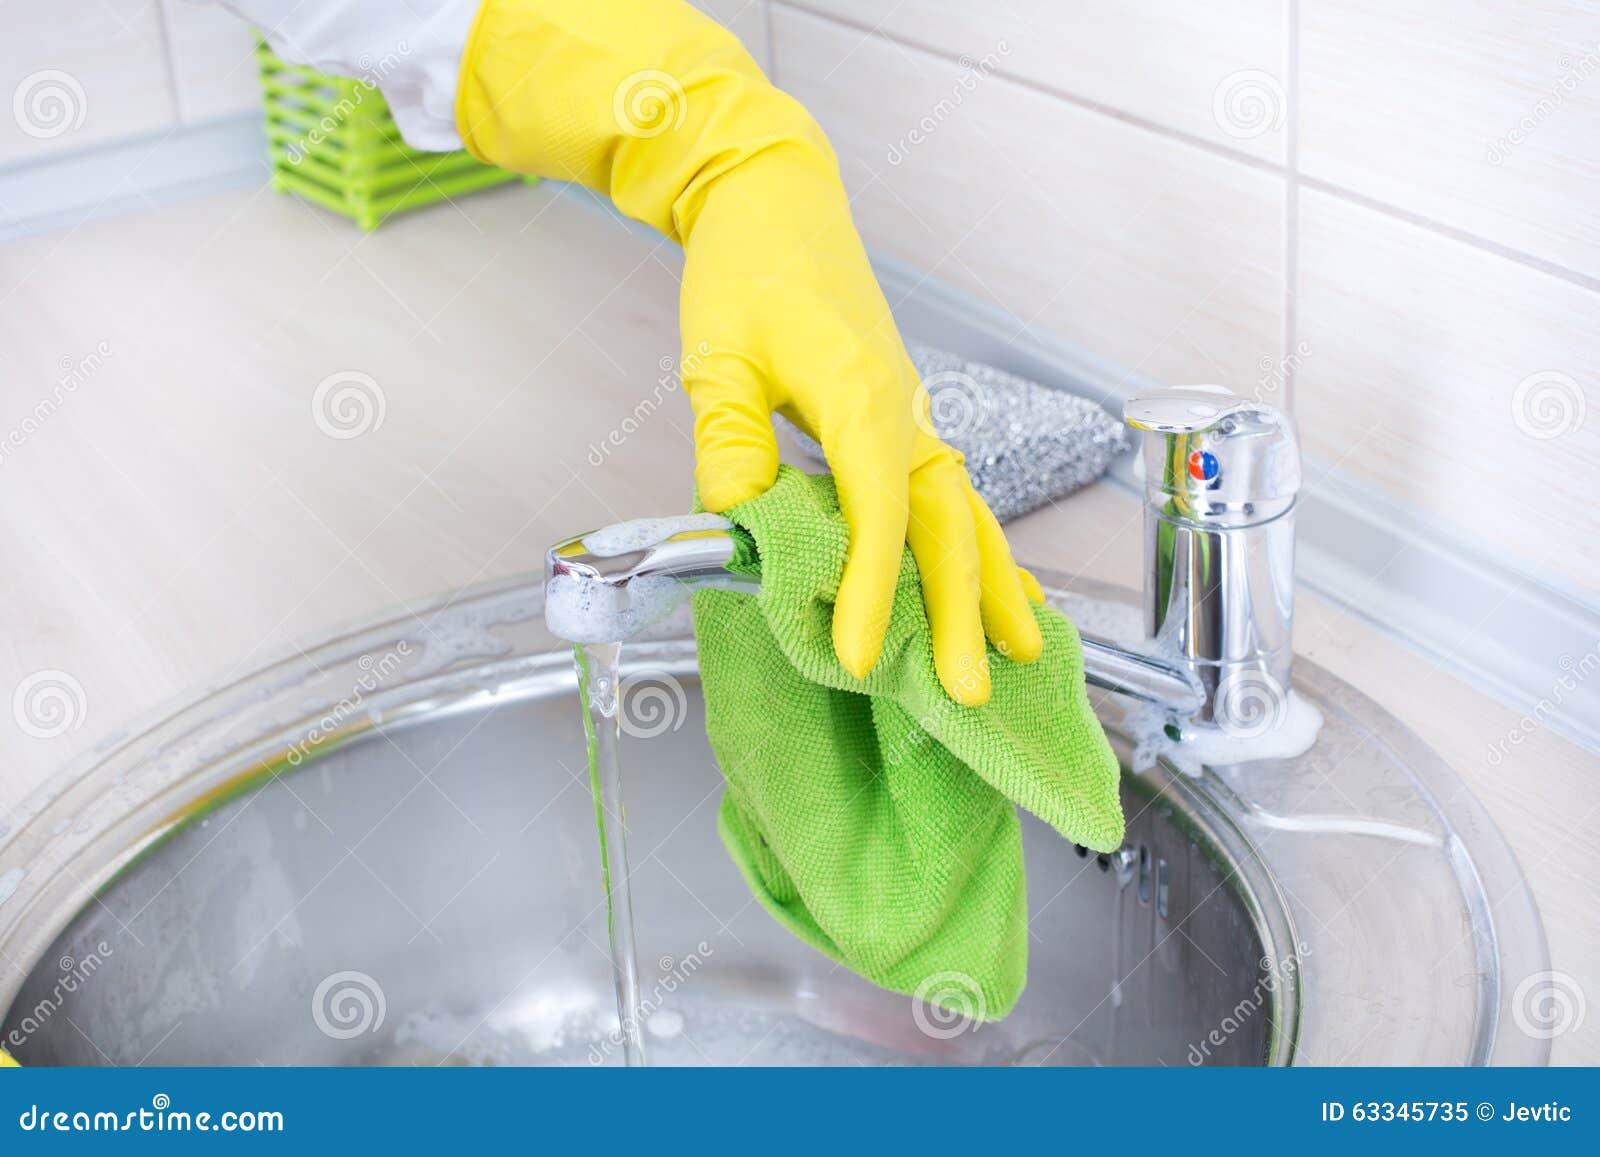 kitchen sink faucet royalty free stock image 91693330. Black Bedroom Furniture Sets. Home Design Ideas